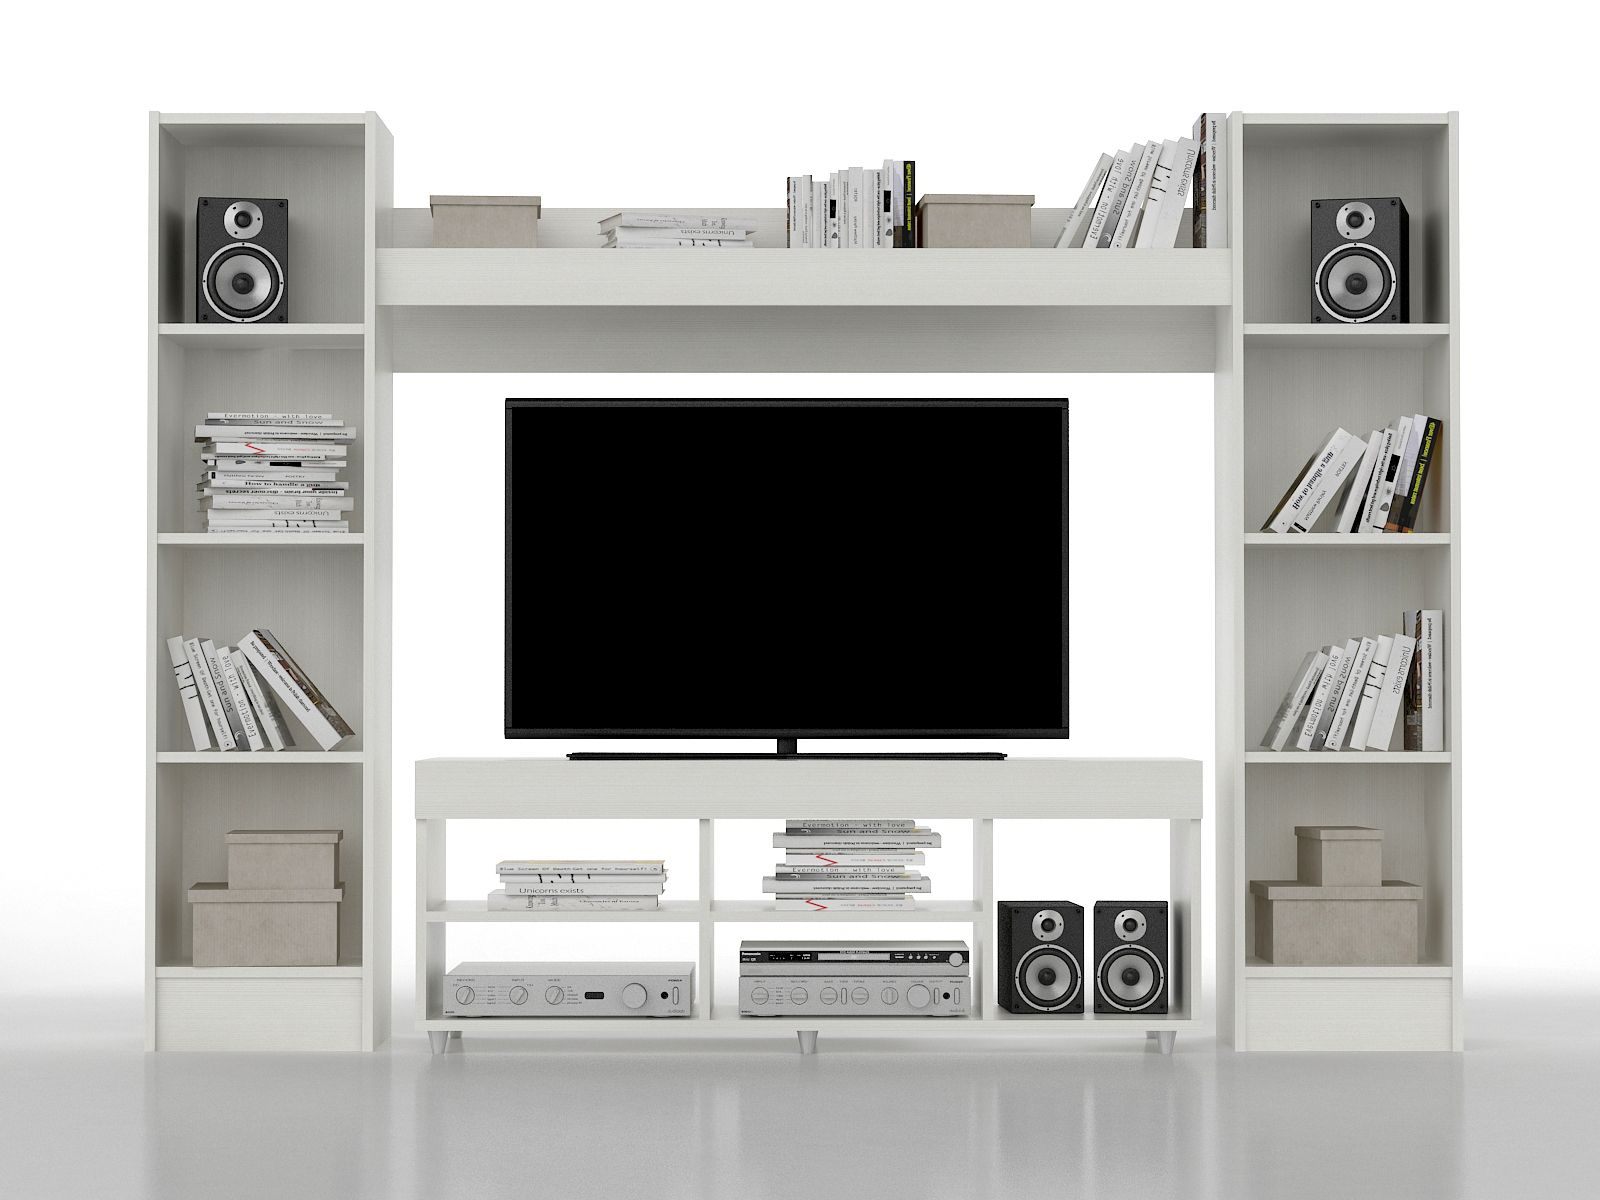 Espaciosos Ideales Para Ubicar Tv Led De Hasta 55 Estos Modelos  # Meuble Tv Zaiken